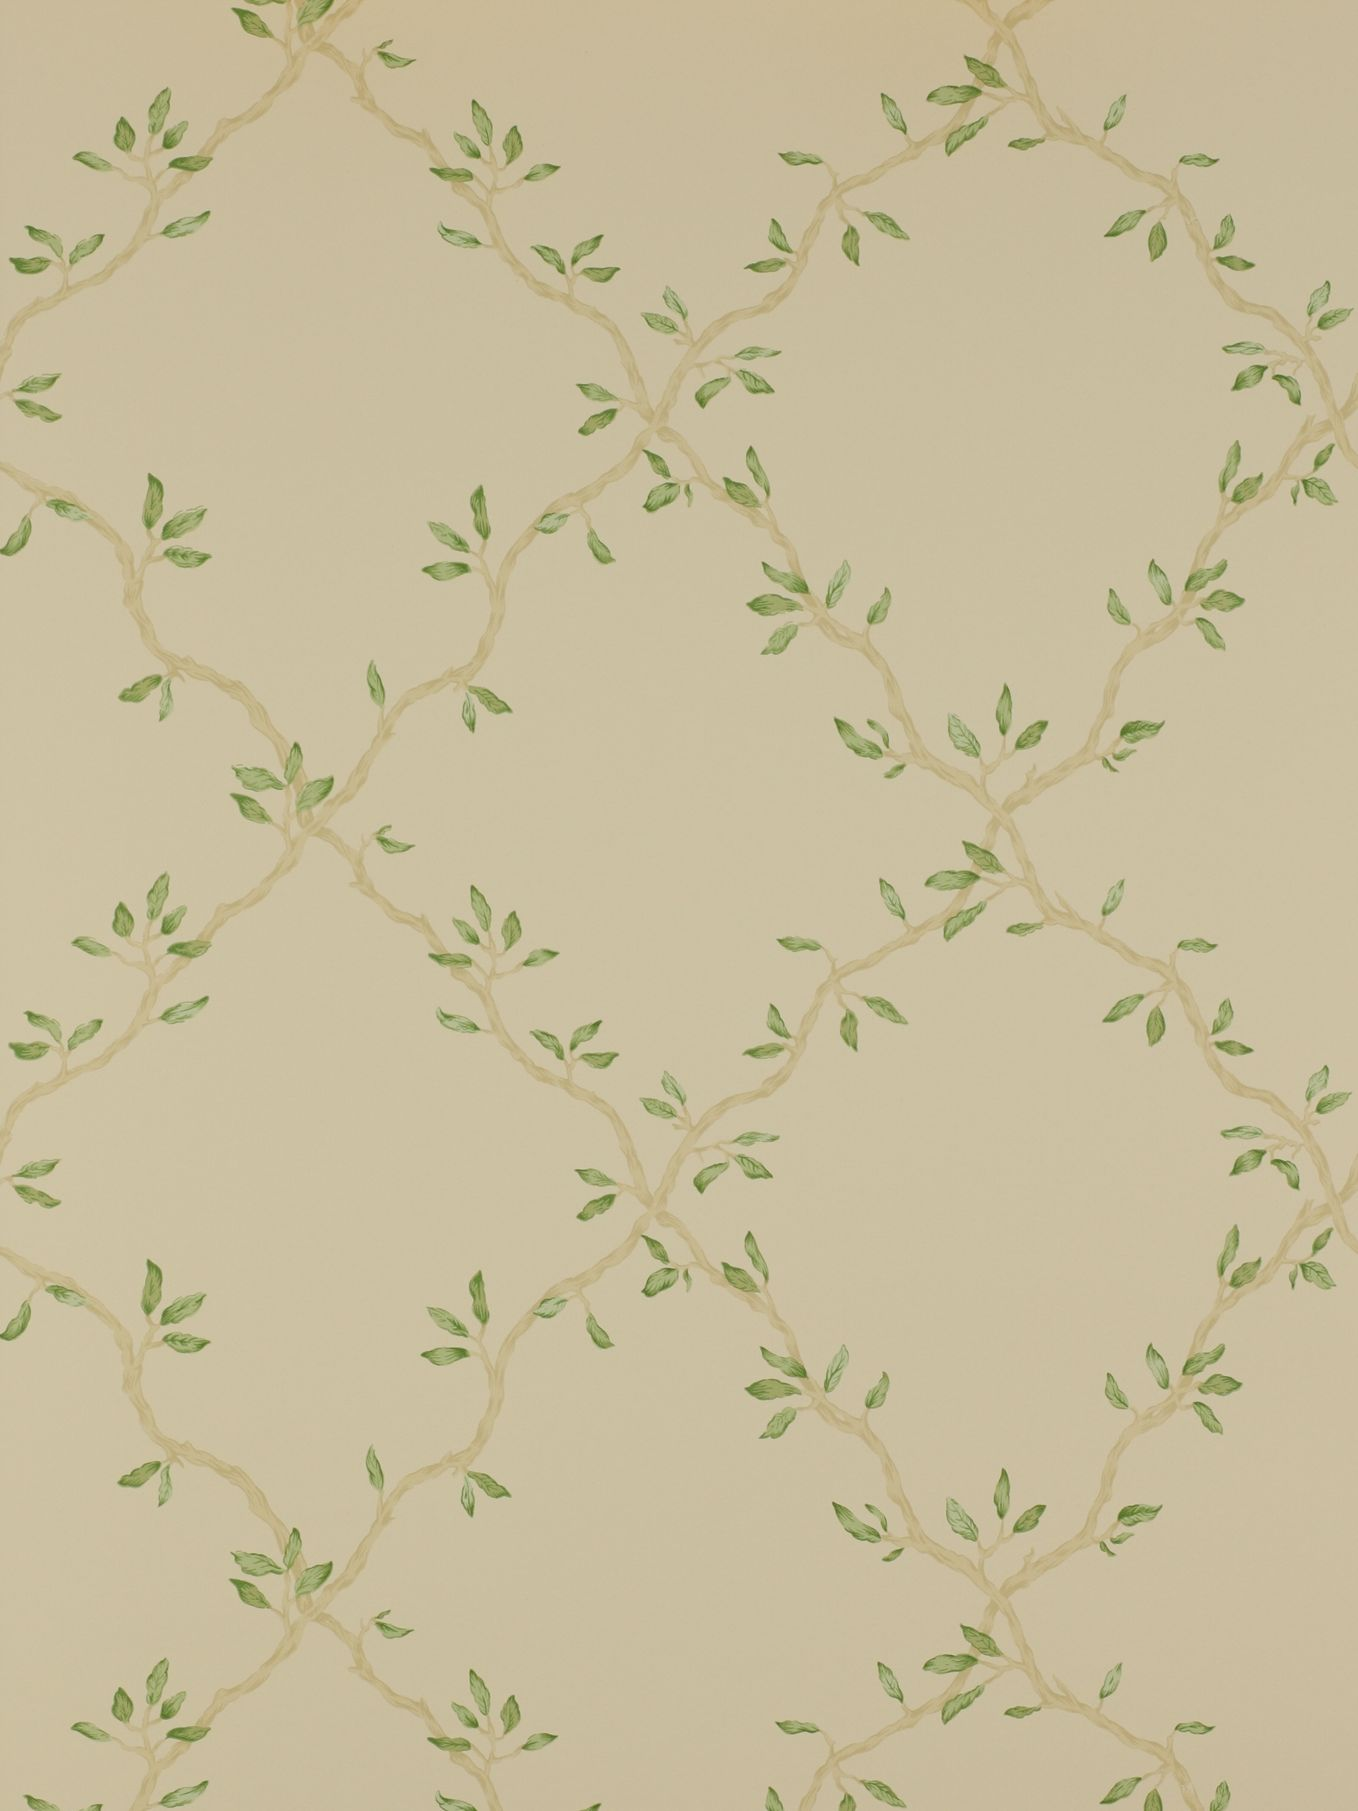 Colefax & Fowler Colefax & Fowler Leaf Trellis Wallpaper